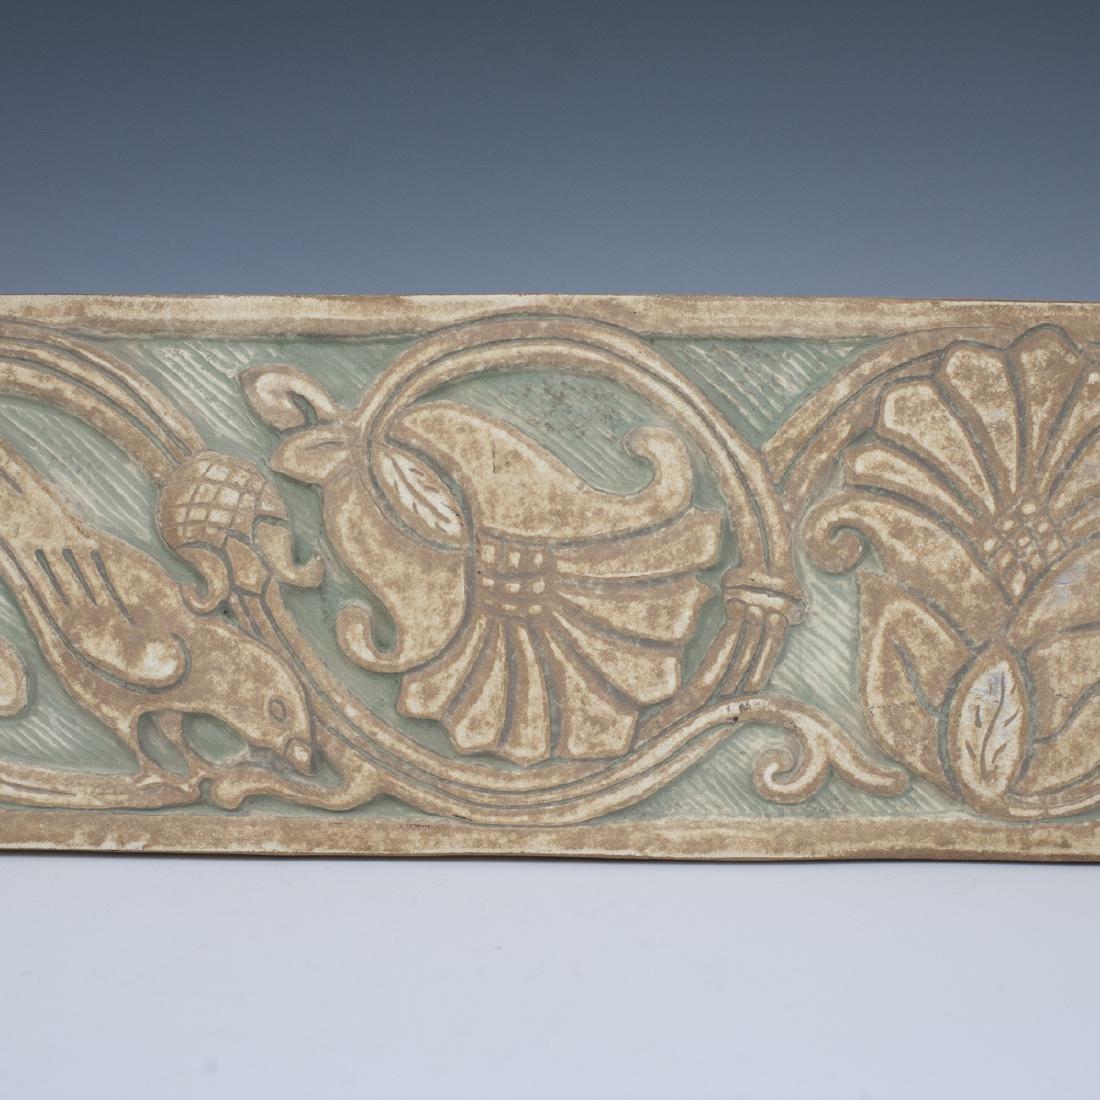 Vintage Pottery Tile - 2